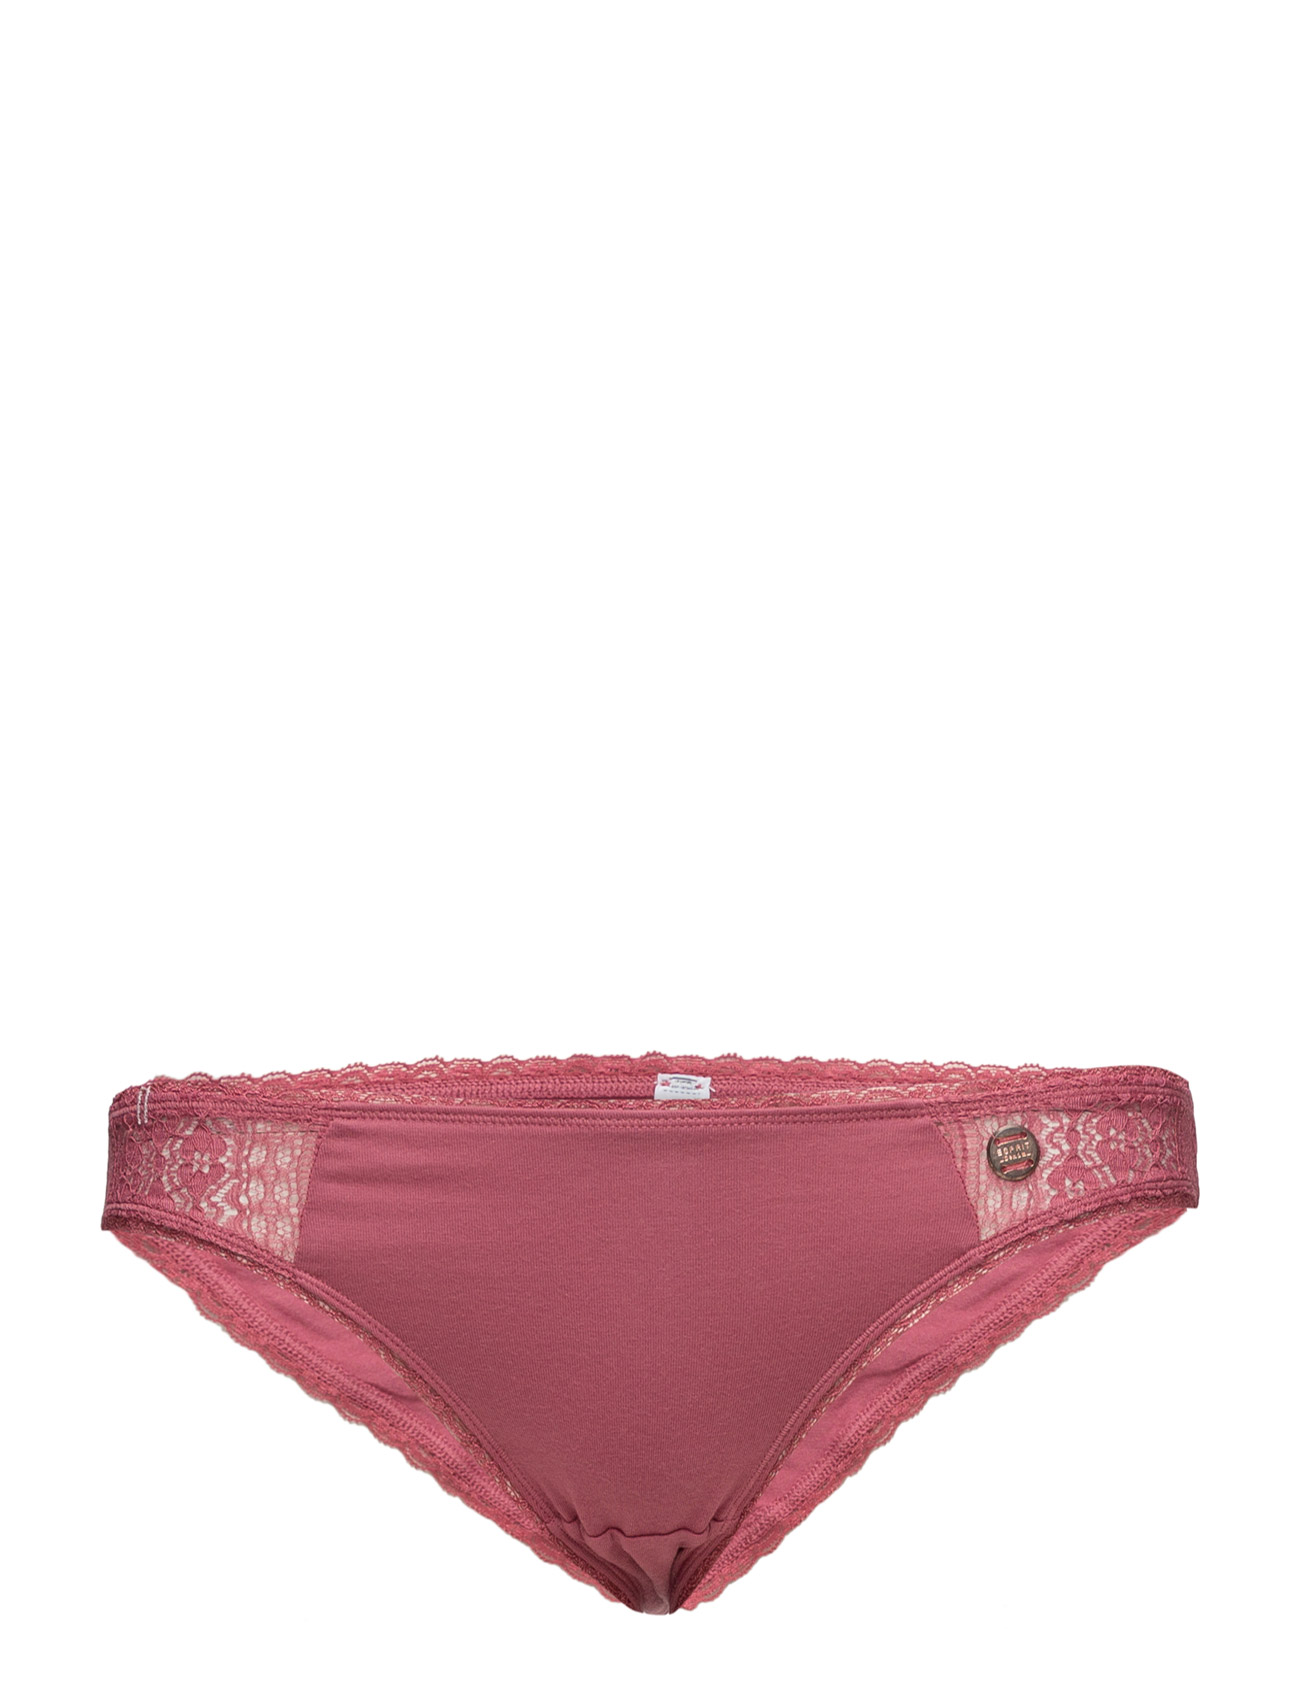 Bottoms Esprit Bodywear Women Trusser til Damer i Rødme